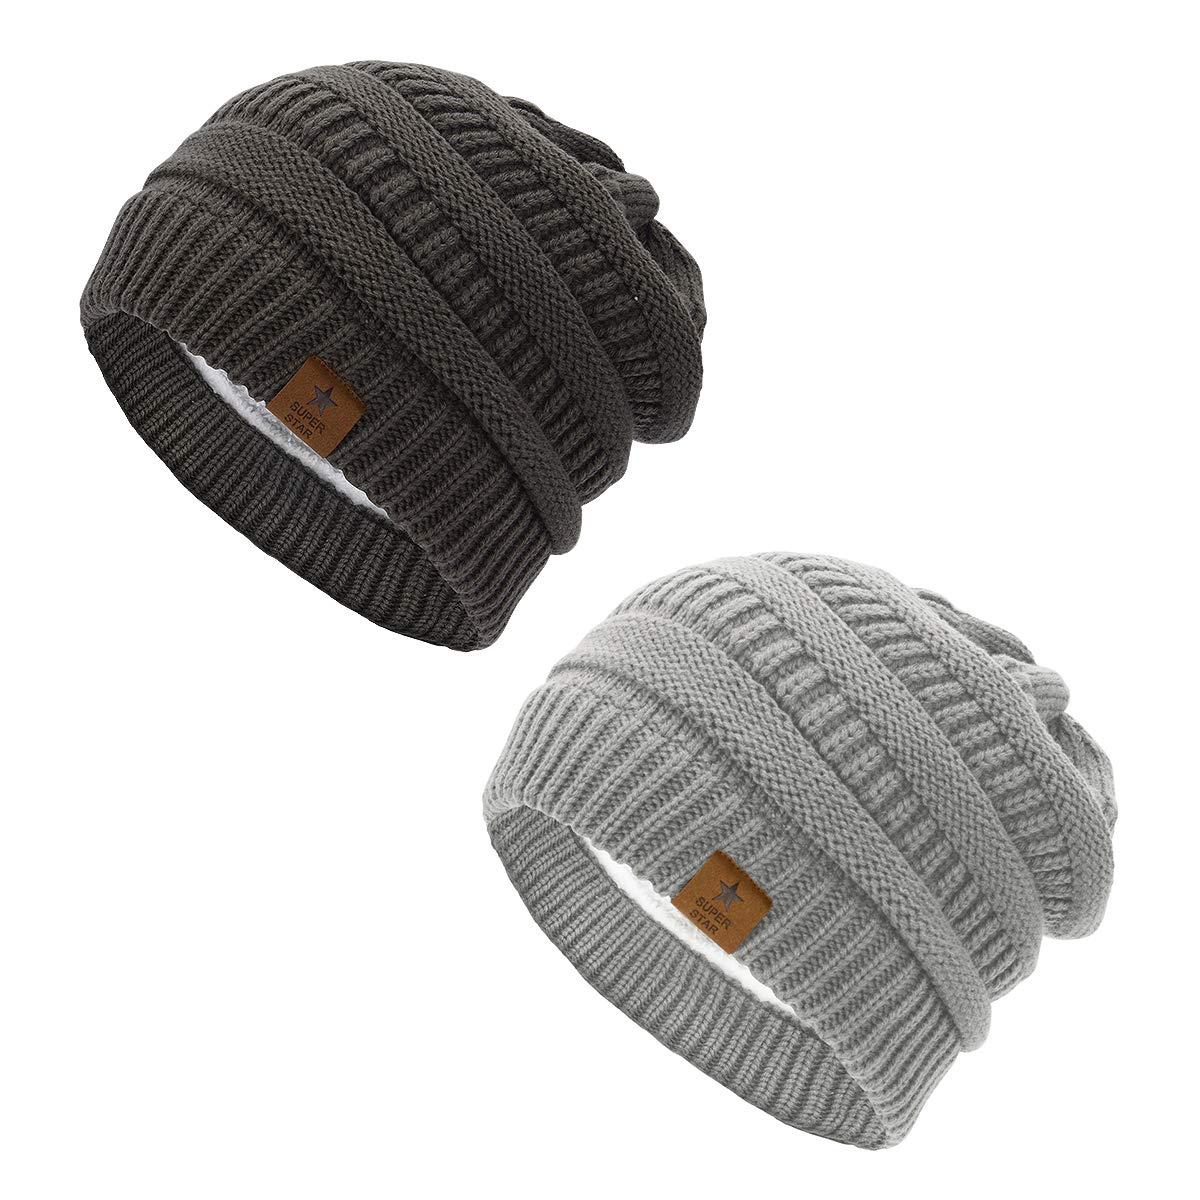 B 2 Pack Dark Grey & Light Grey Durio Winter Warm Thermal Wool Thick Socks Knitting Printed Crew MidCalf Socks for Women Girls